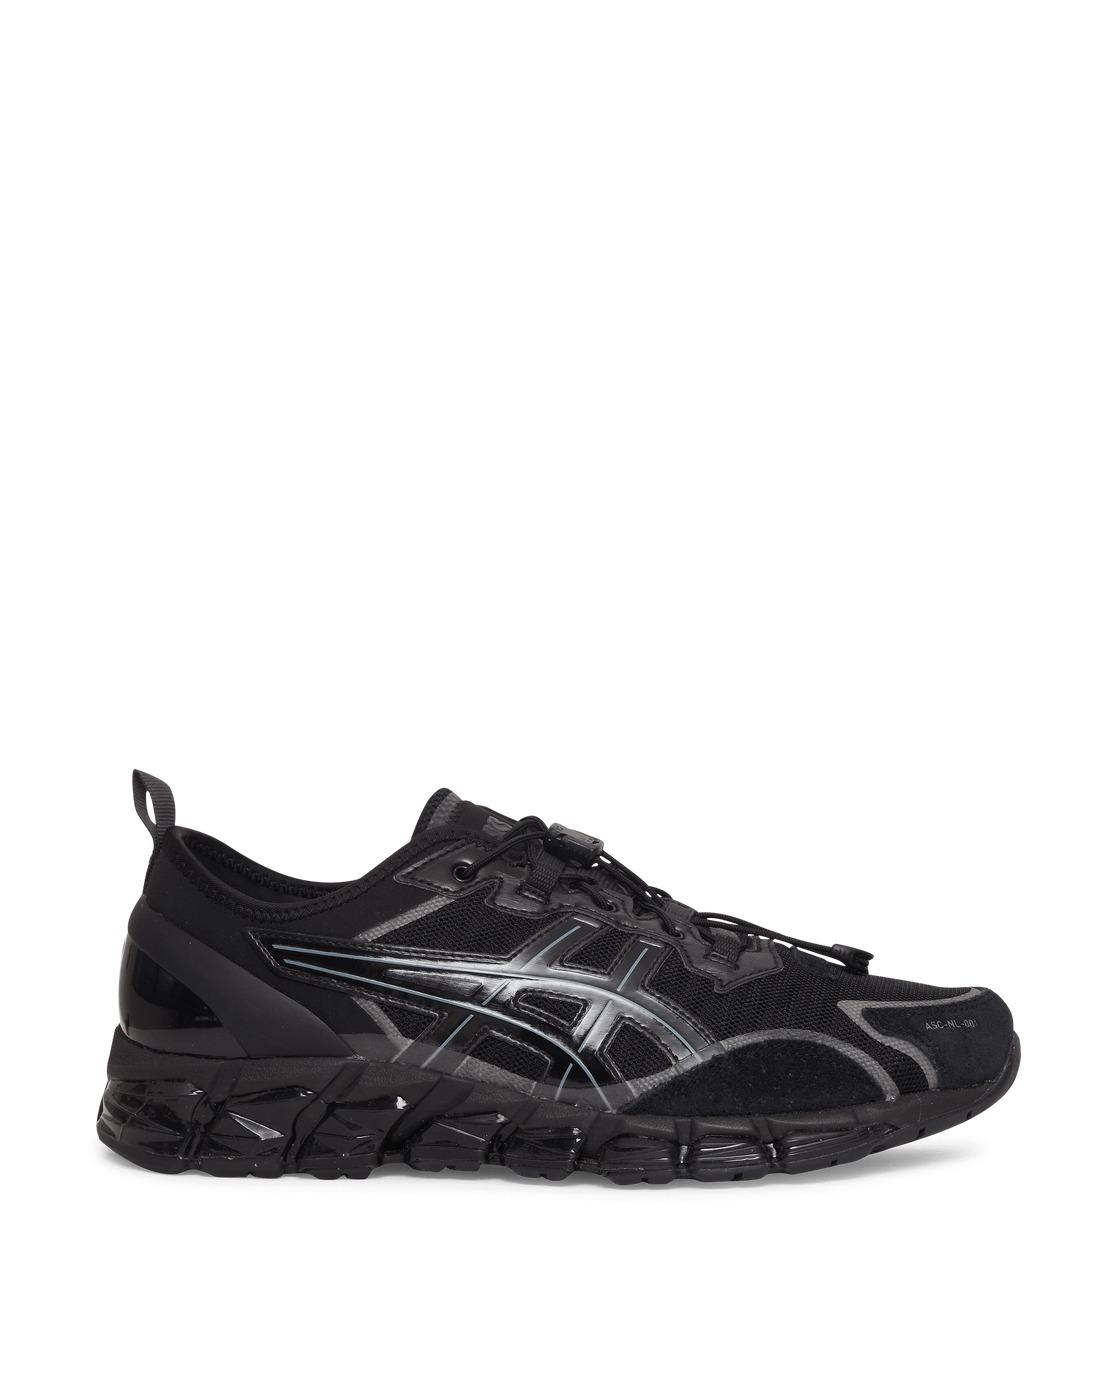 Asics Nu Label Gel Quantum 360 6 Sneakers Black/Black